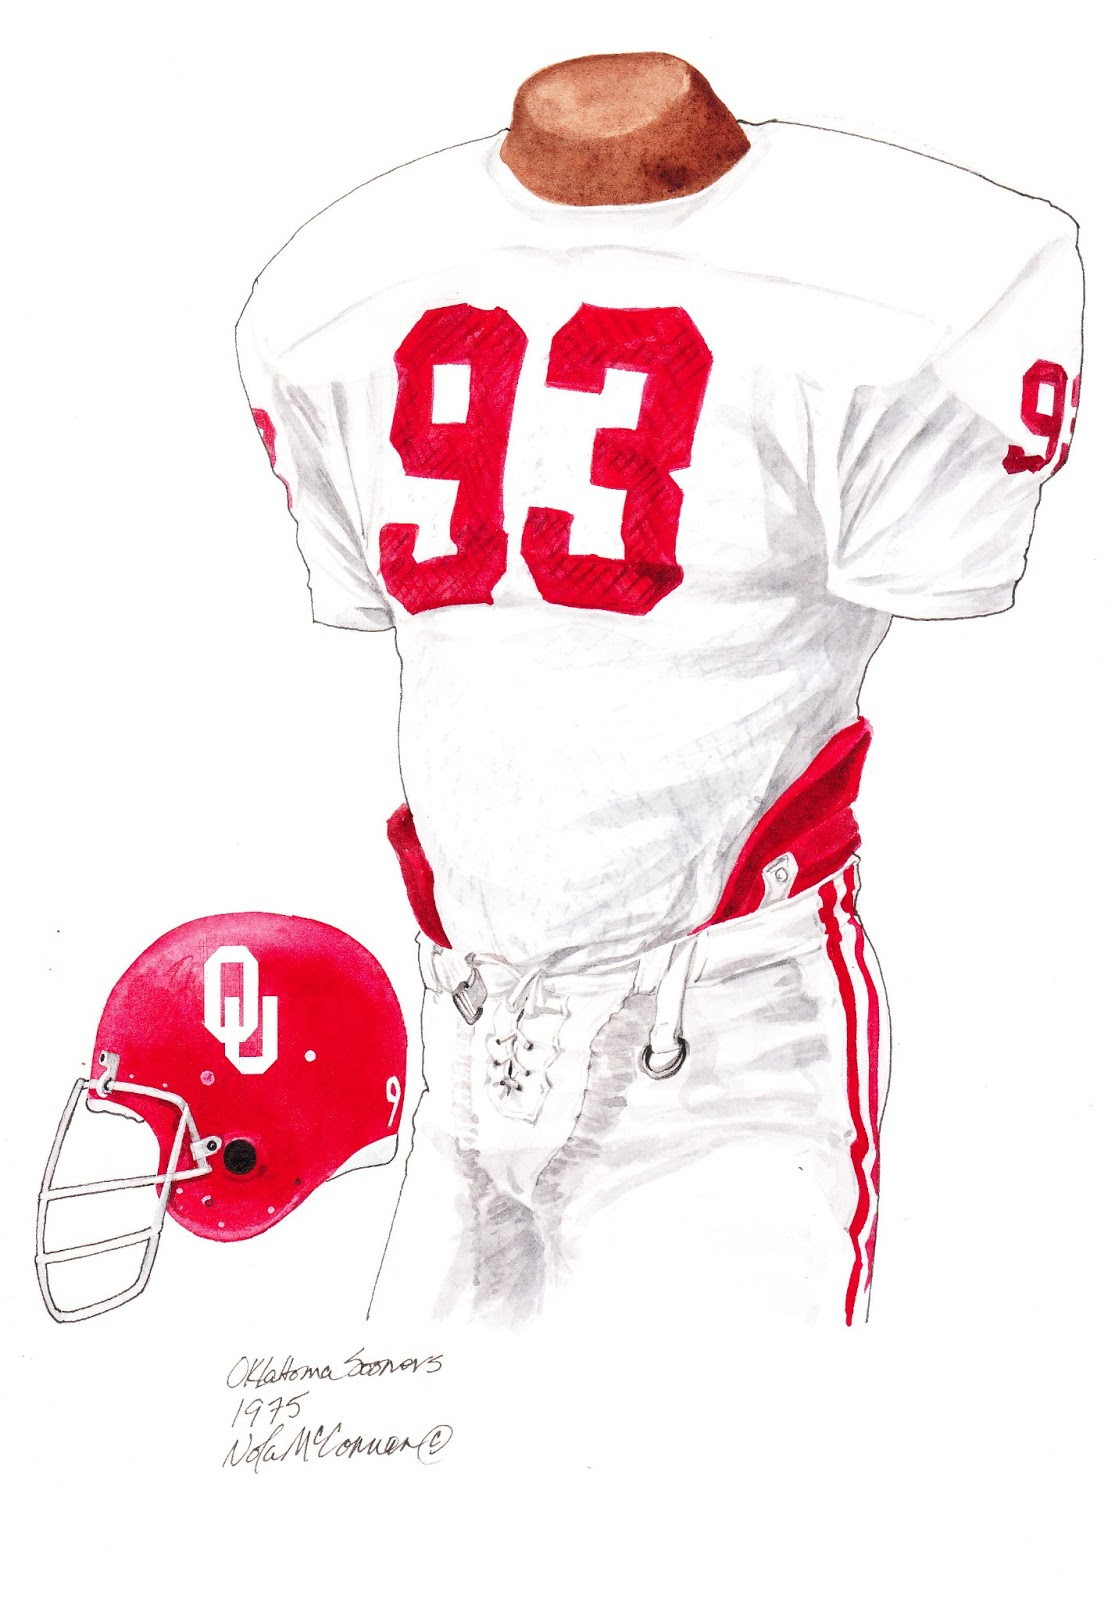 timeless design 4ed62 fa7f0 University of Oklahoma Sooners Football Uniform and Team ...